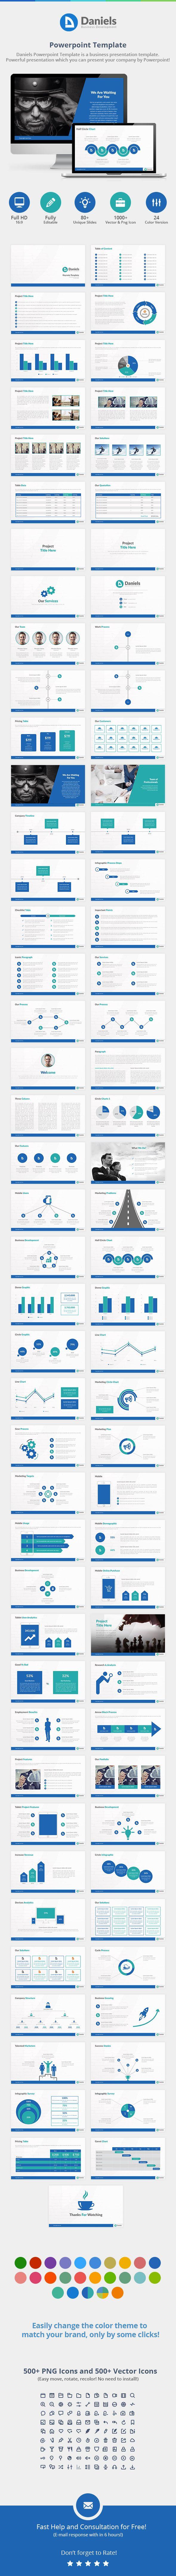 Daniels Powerpoint Presentation Template. Download here: http://graphicriver.net/item/daniels-powerpoint-presentation-template/15135497?ref=ksioks